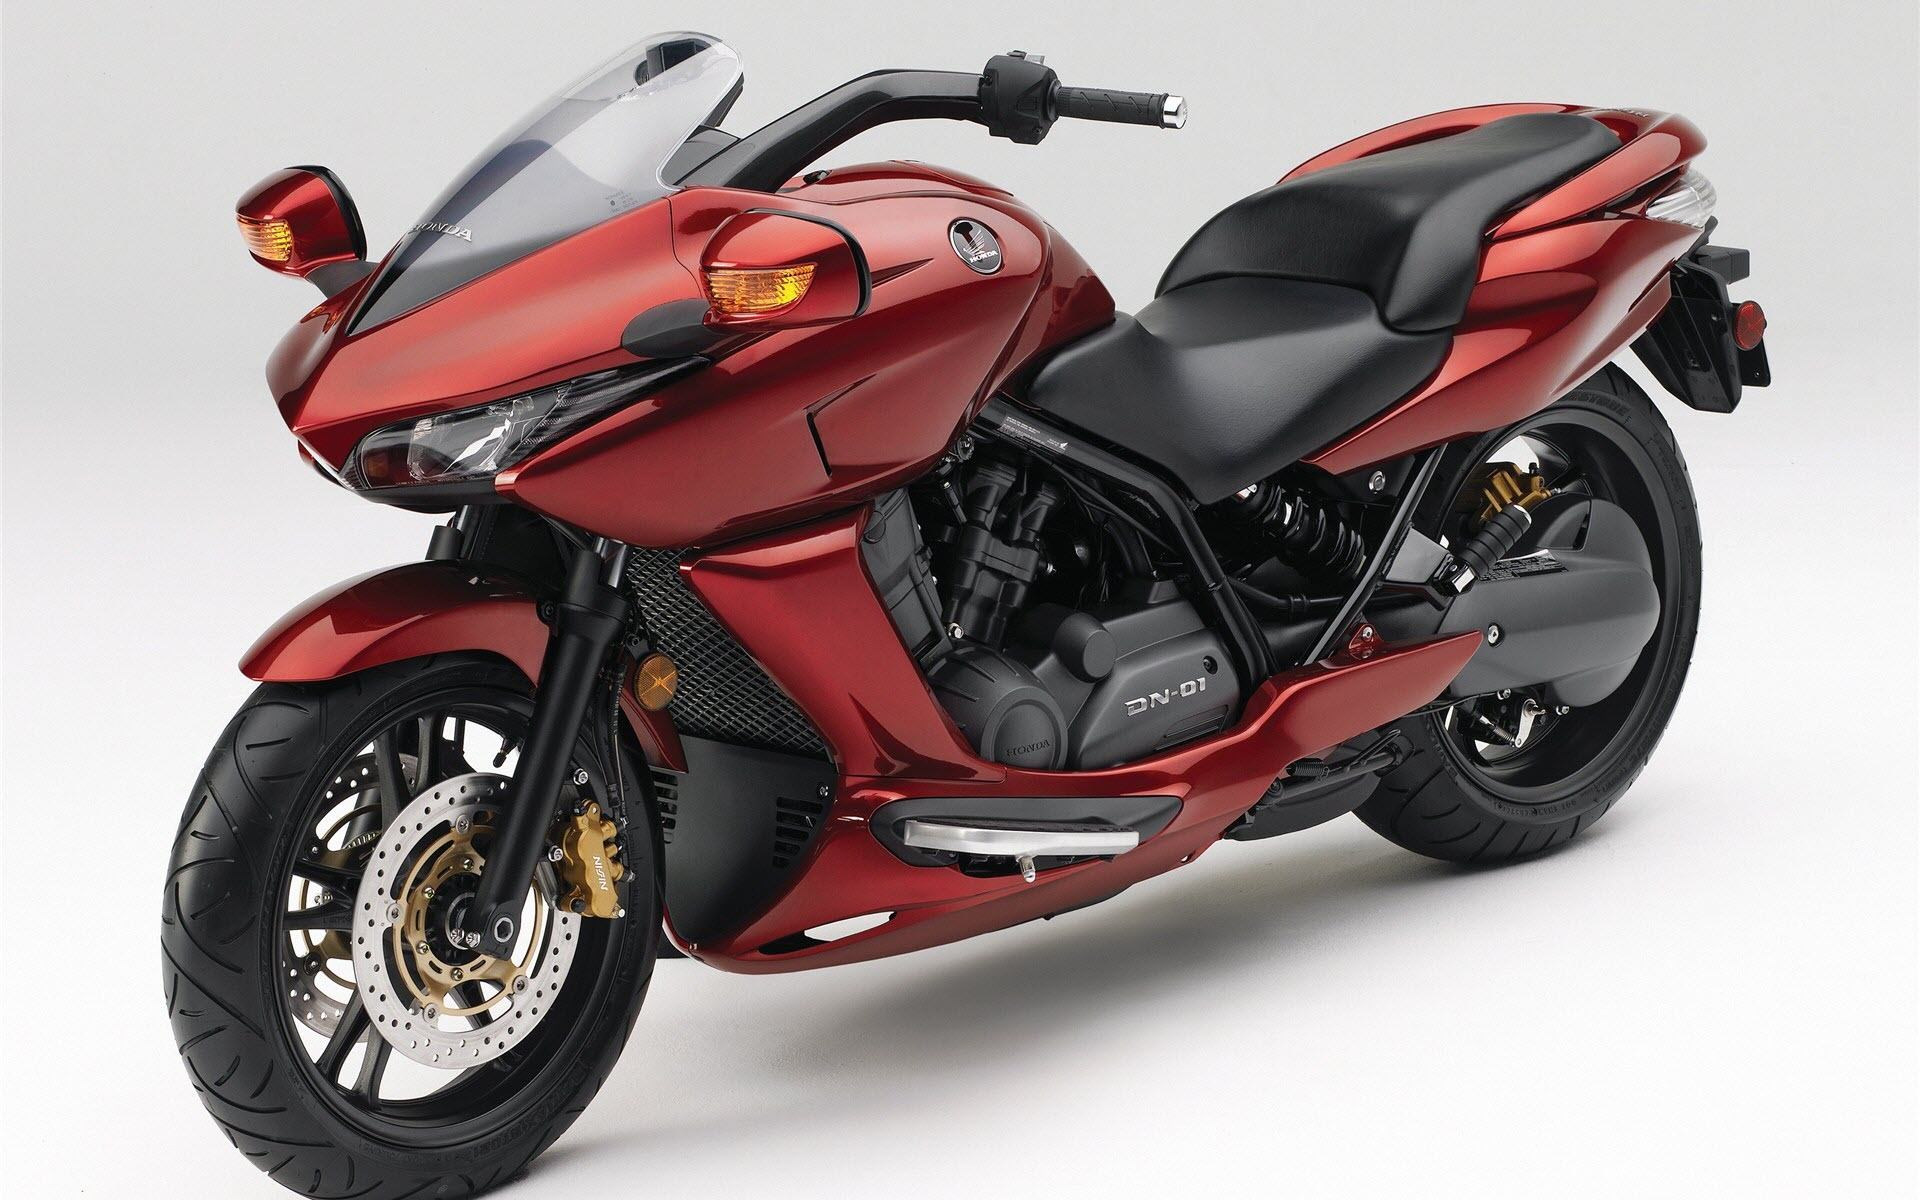 Корзину, картинки мотоциклов крутые